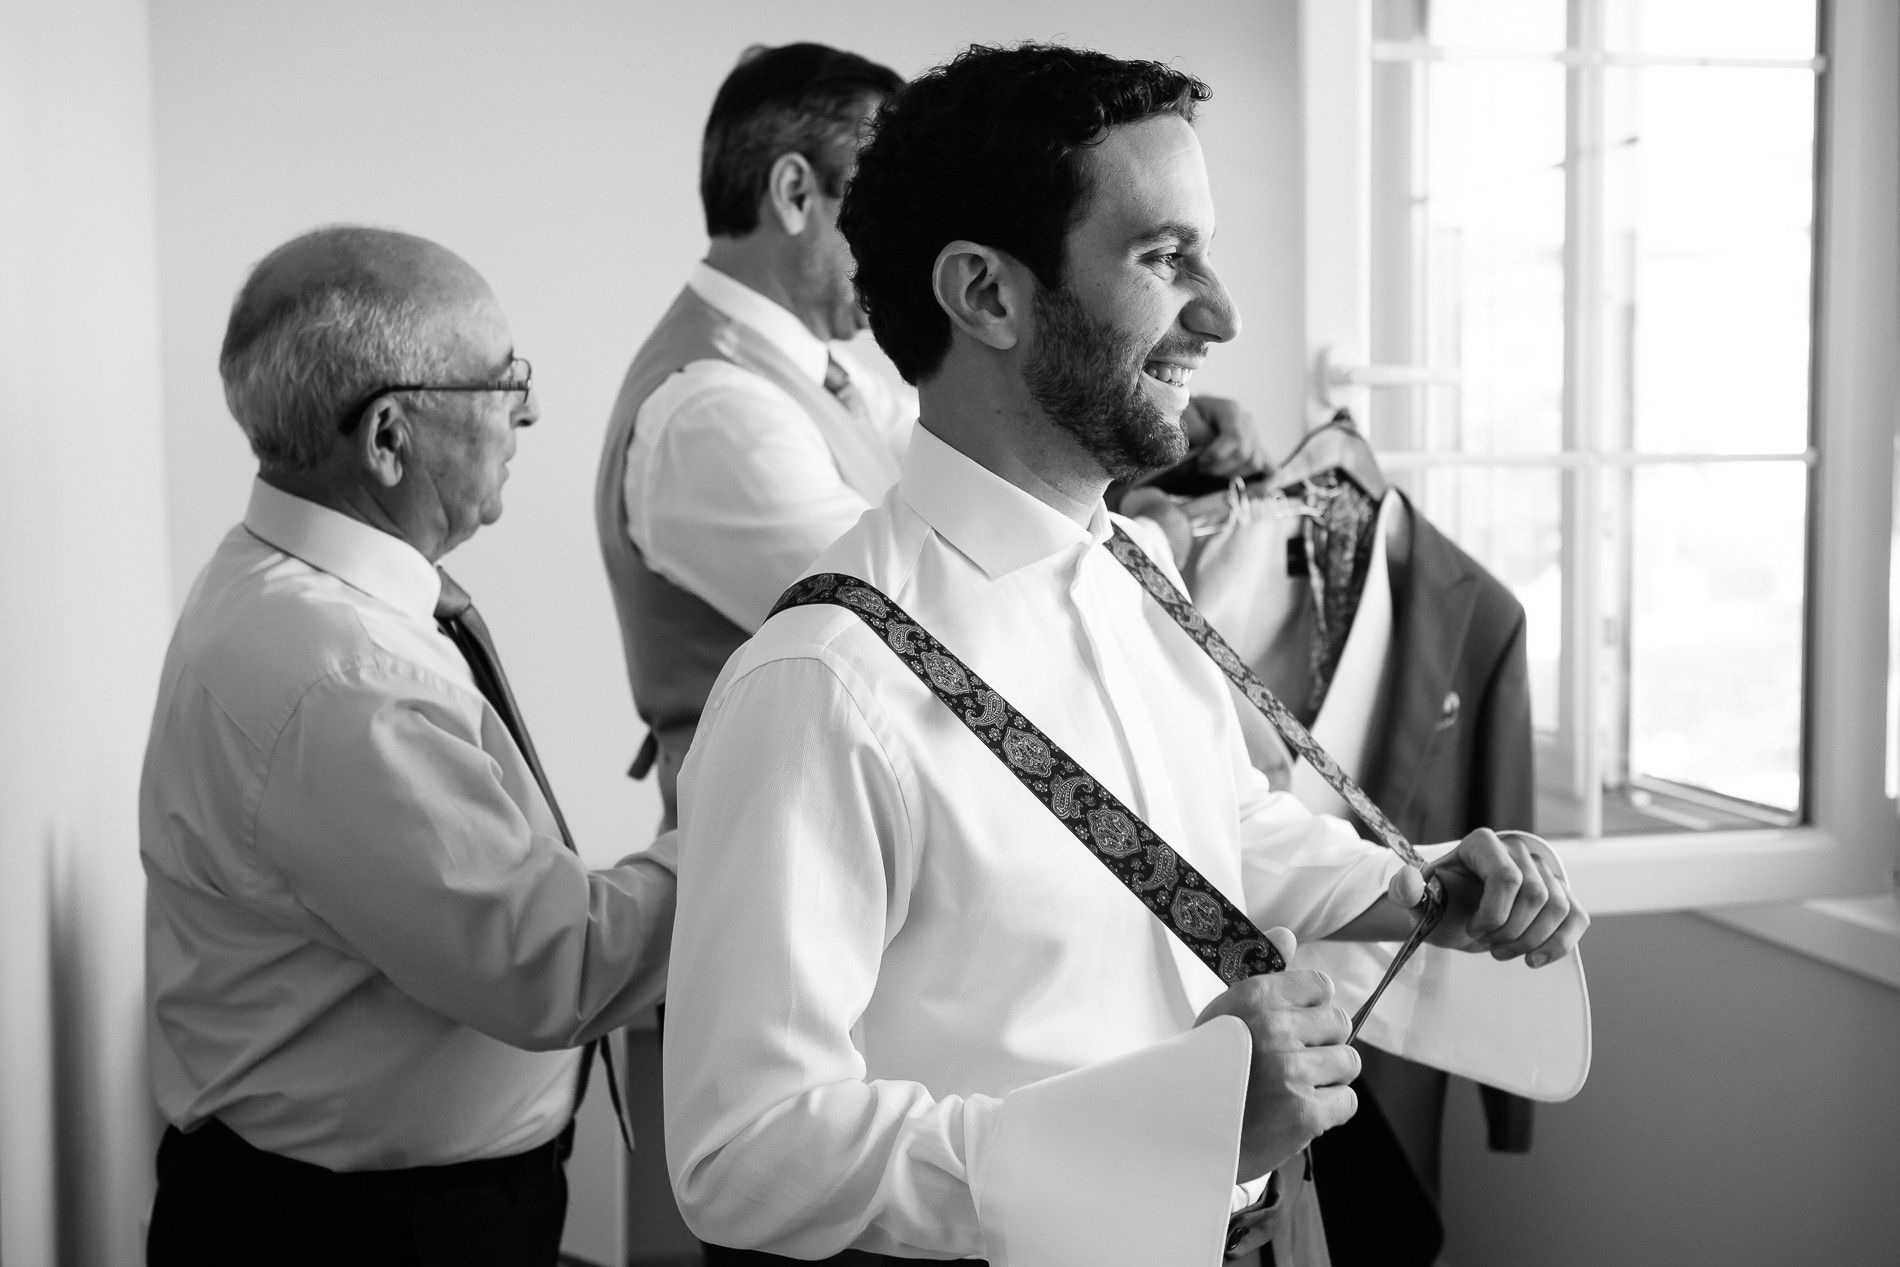 fotografo-de-boda-plasencia-08